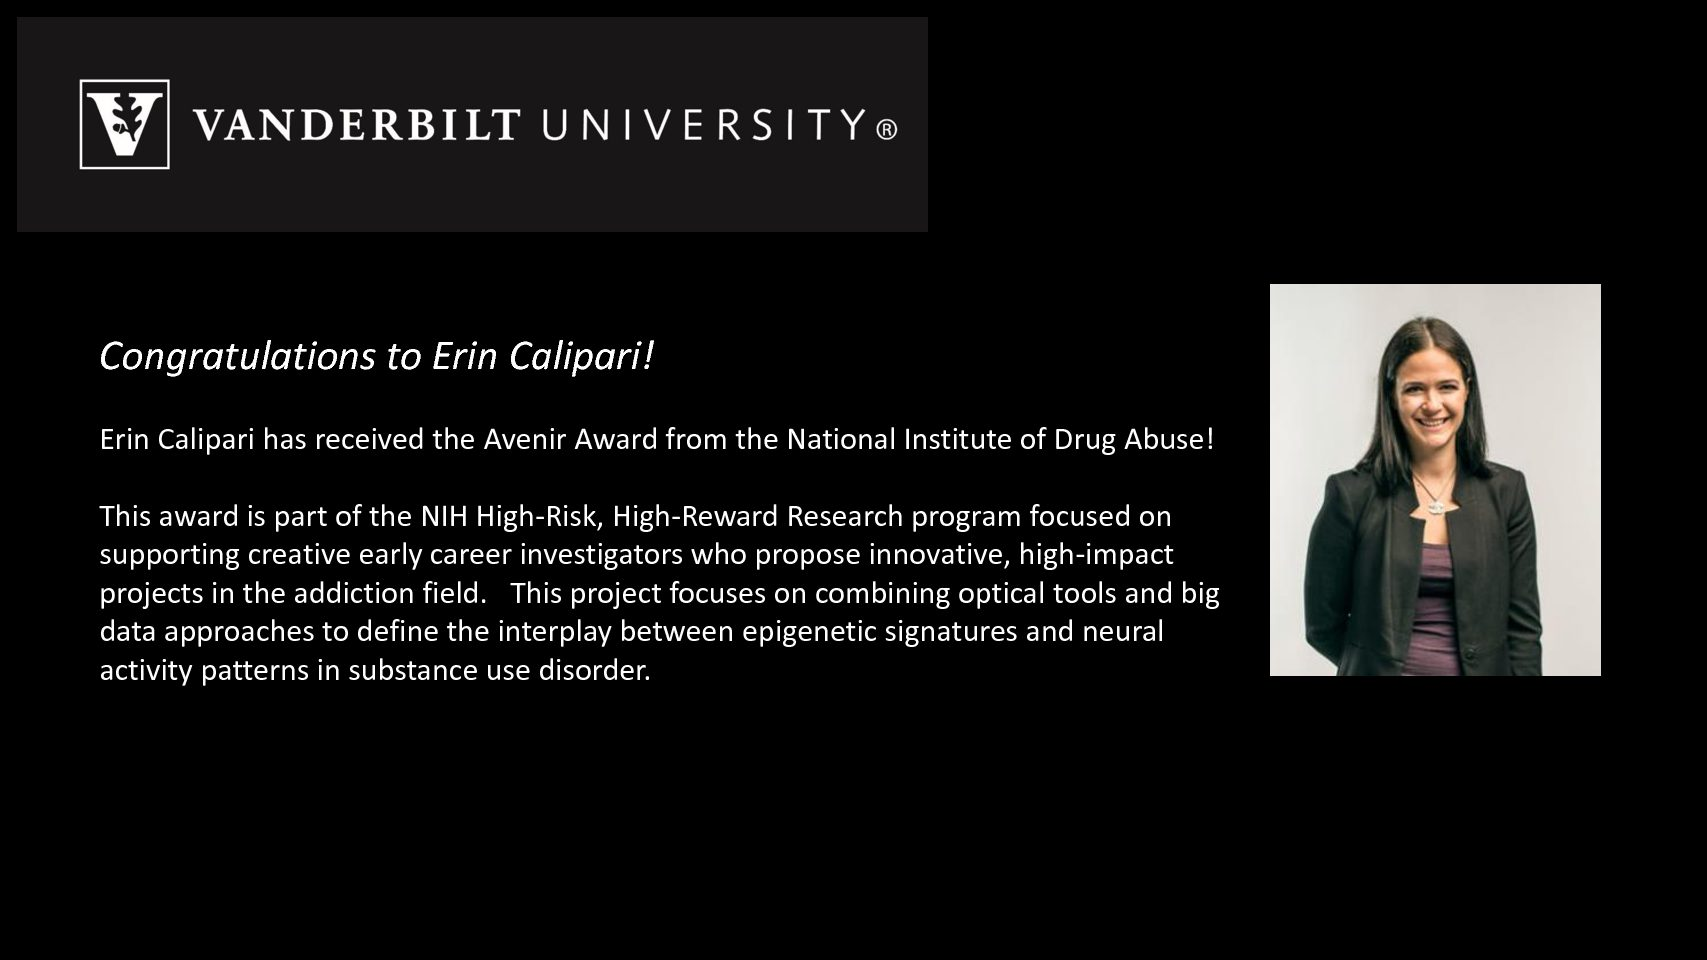 Erin Calipari Congratulations 2019